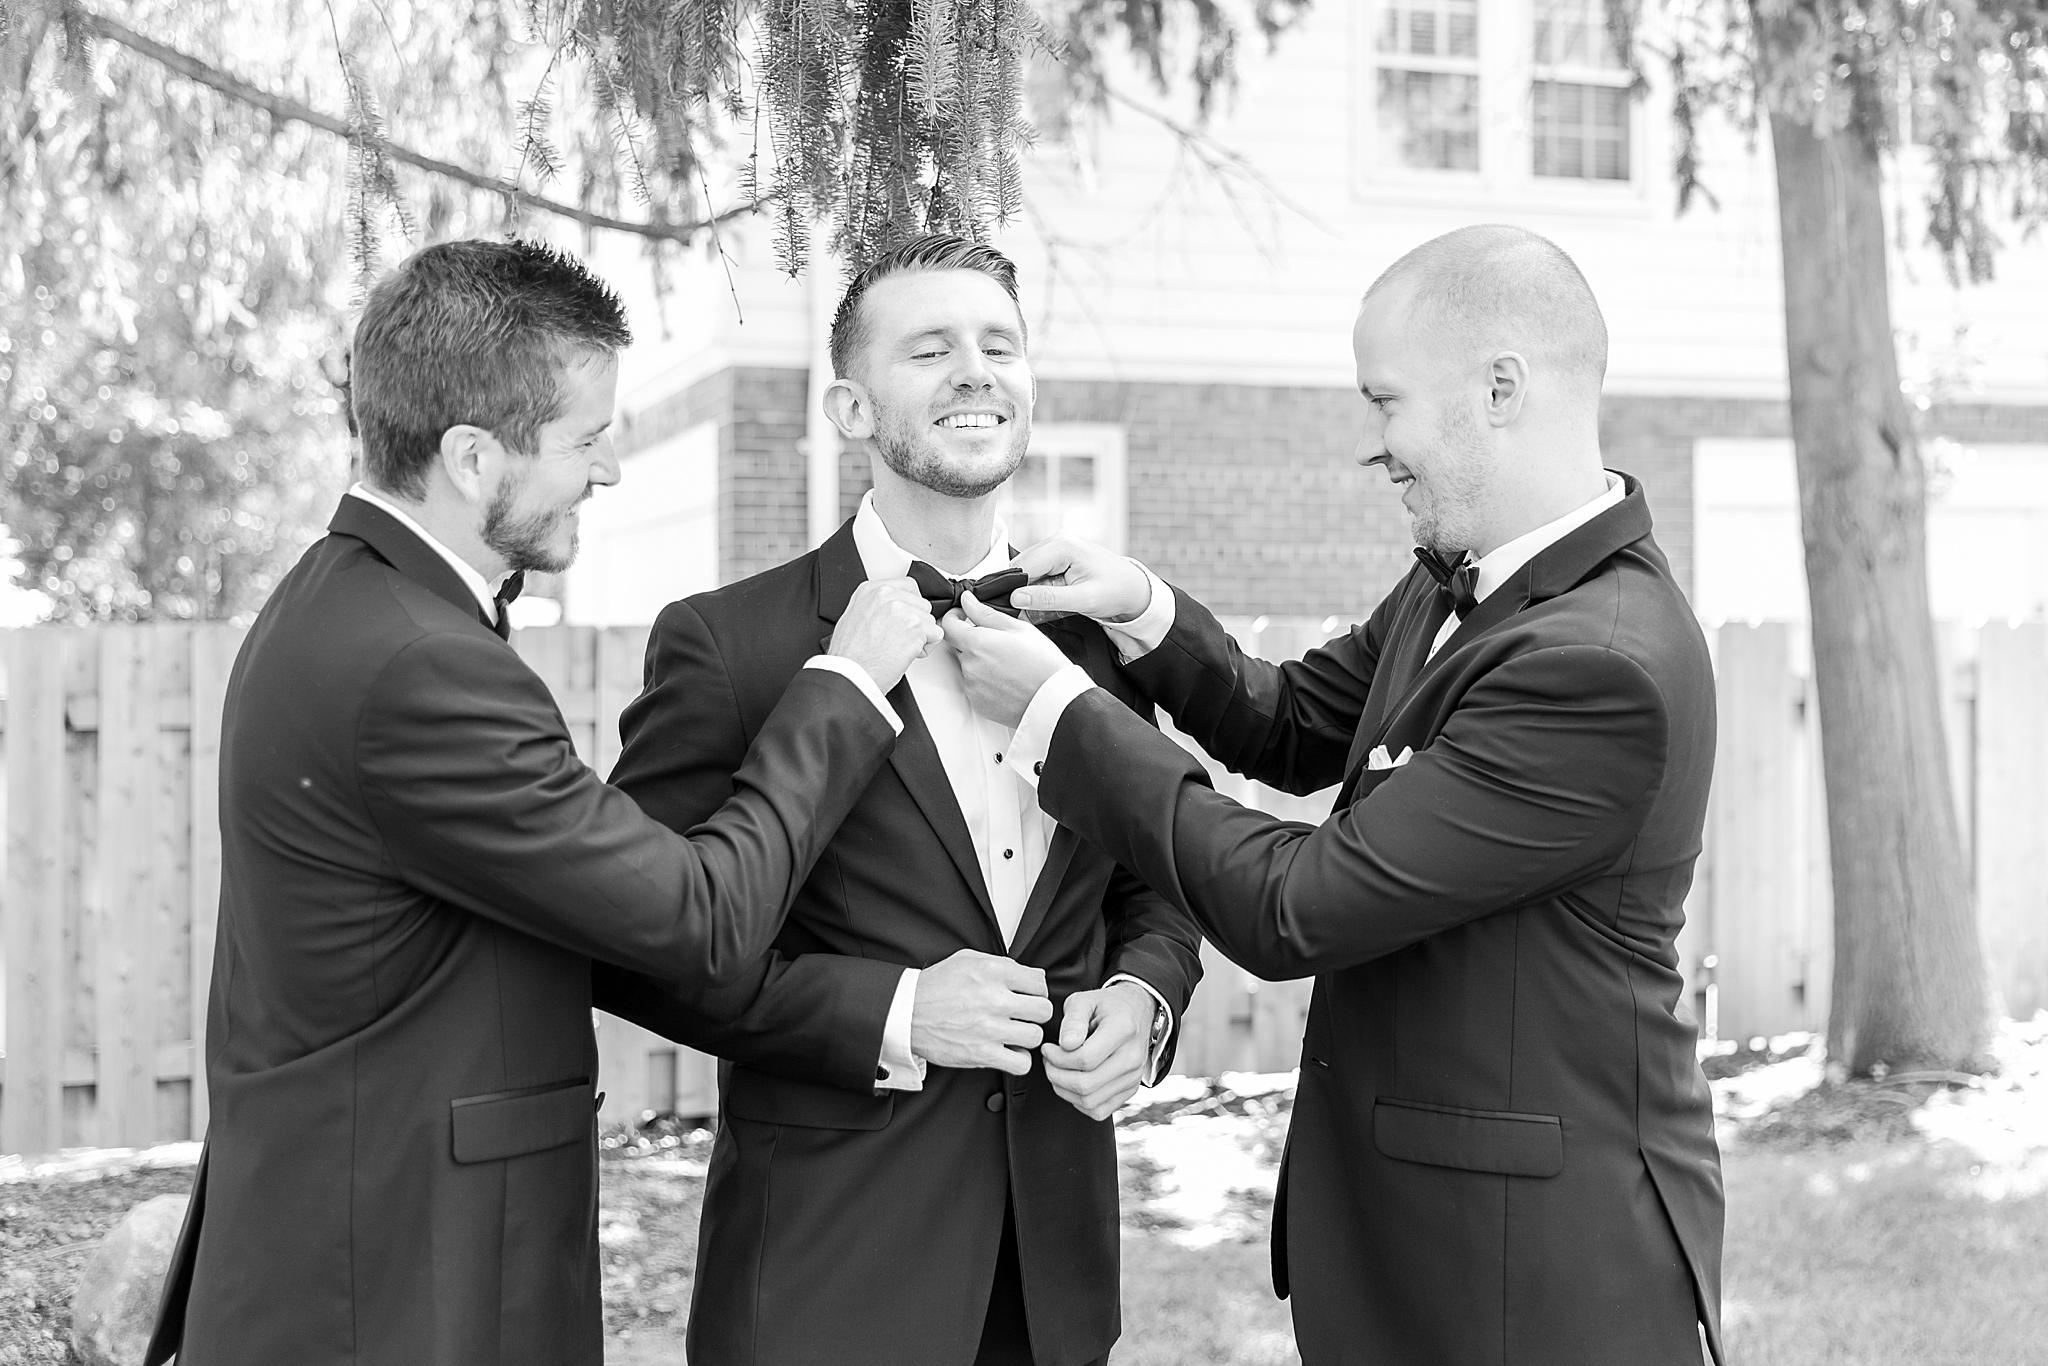 detroit-wedding-photographer-grosse-pointe-academy-chapel-detroit-golf-club-wedding-carly-matt-by-courtney-carolyn-photography_0006.jpg